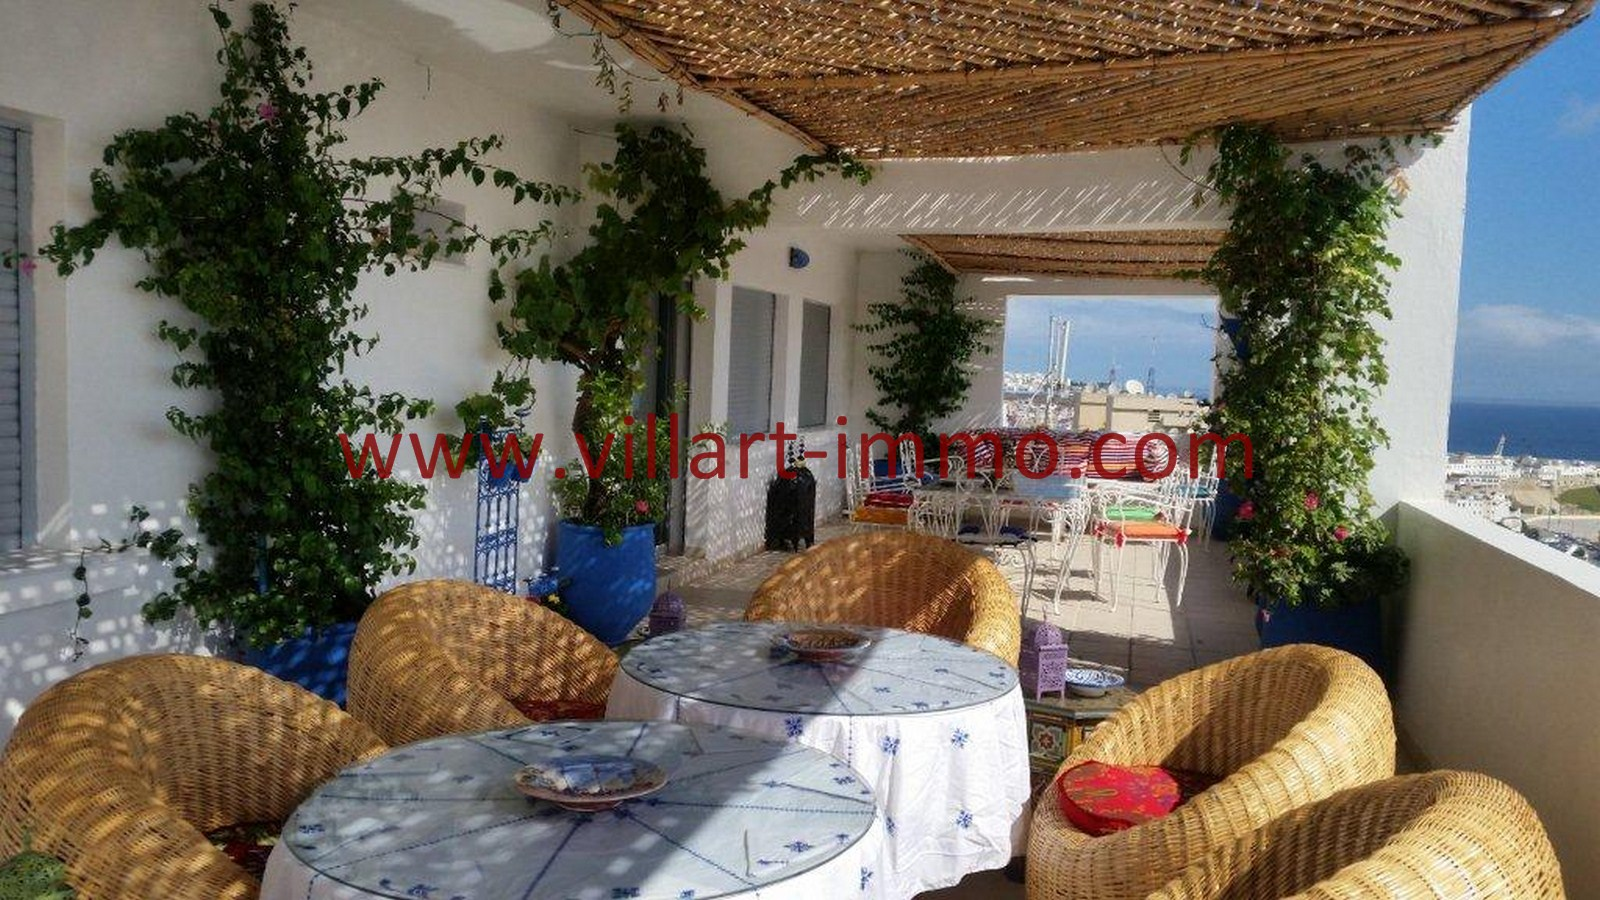 3-Vente-Appartement-Tanger-Centre-De-Ville-Terrasse 3-VA502-Villart Immo